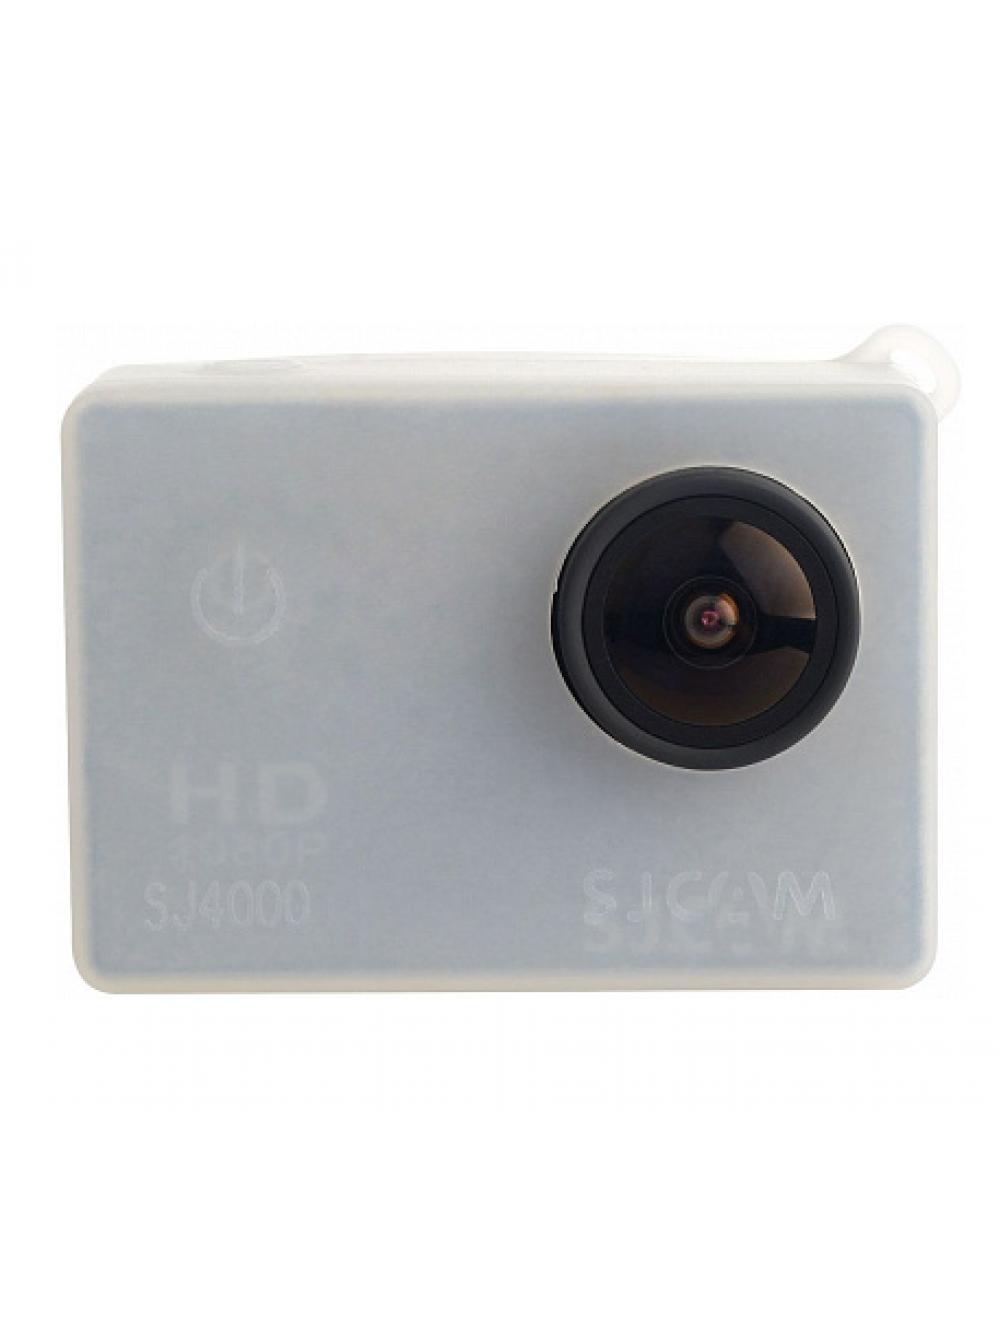 Кейс SJCAM SJ4000 Silicon Cover